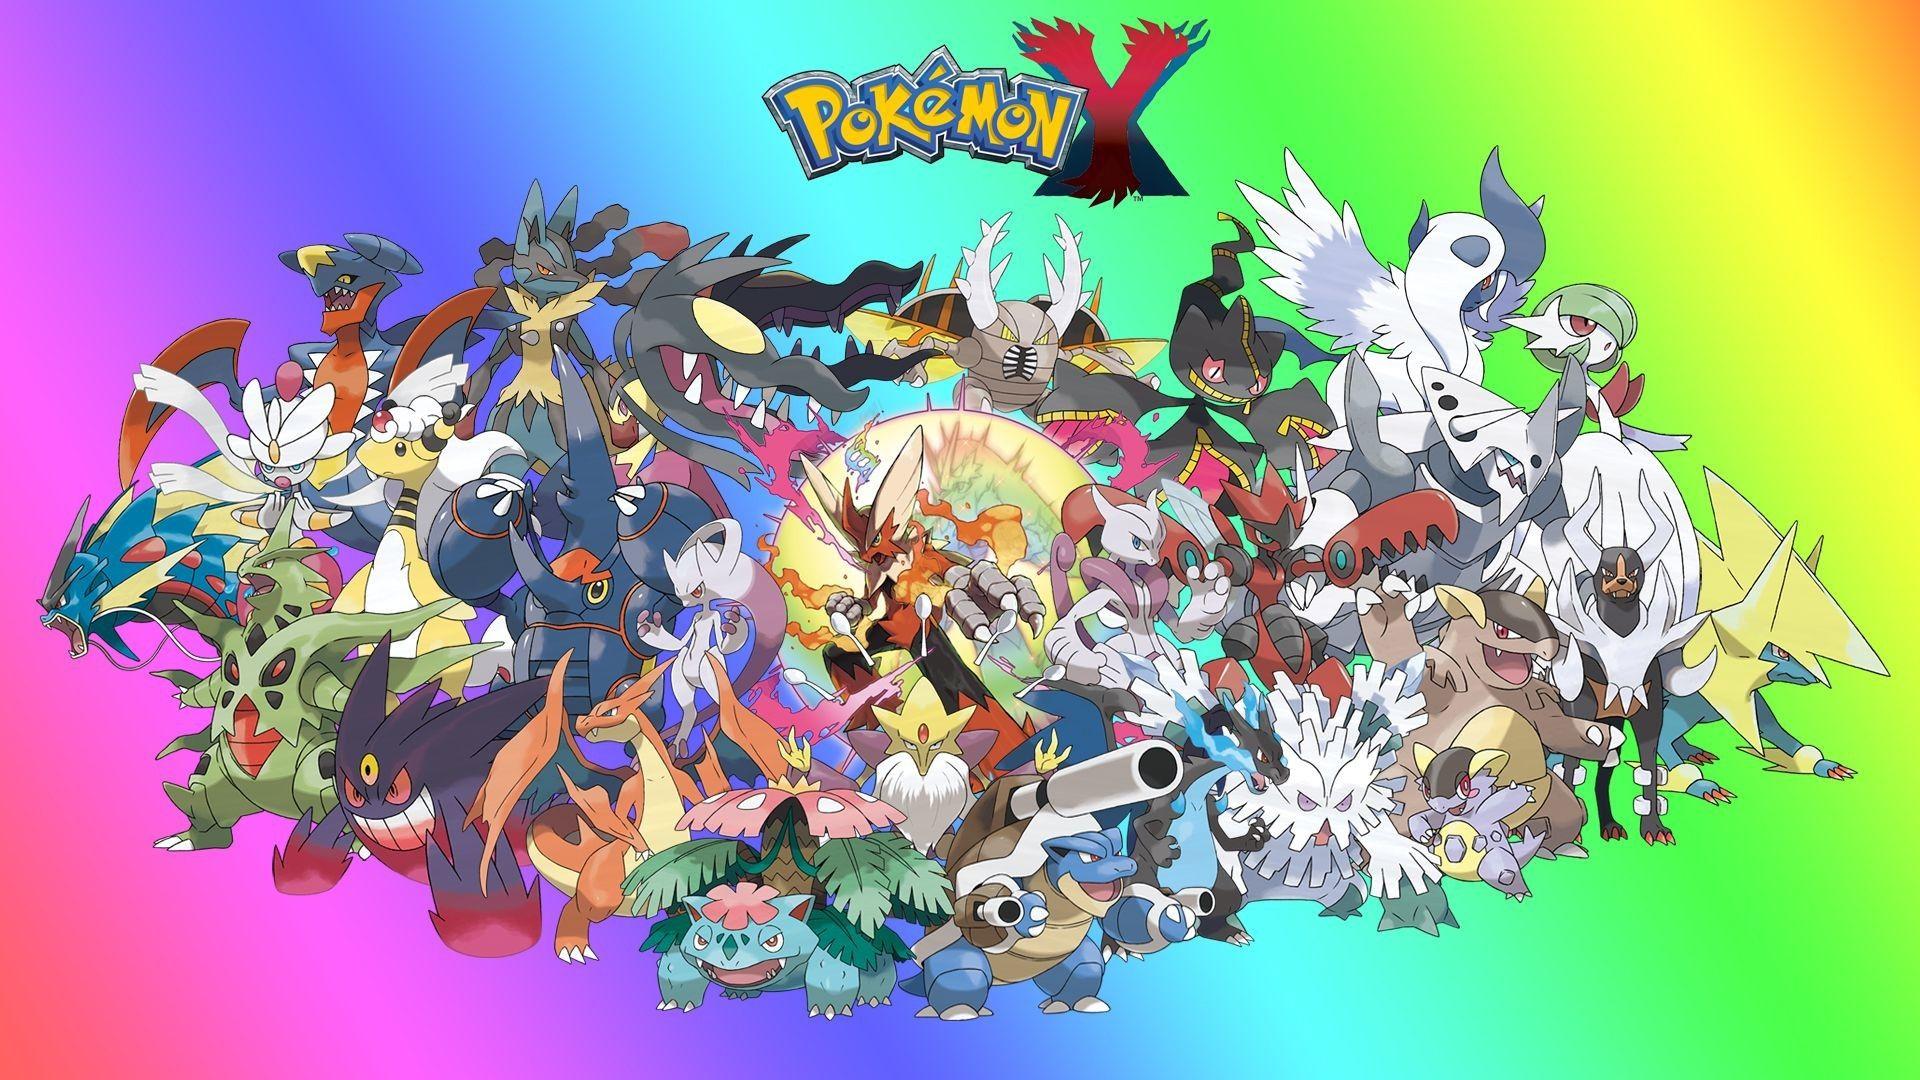 Mega Evolution Greninja Pokemon Wallpaper 70 Mega Evolution Wallpapers On Wallpaperplay In 2020 Cute Pokemon Wallpaper Android Wallpaper Anime Anime Wallpaper Iphone